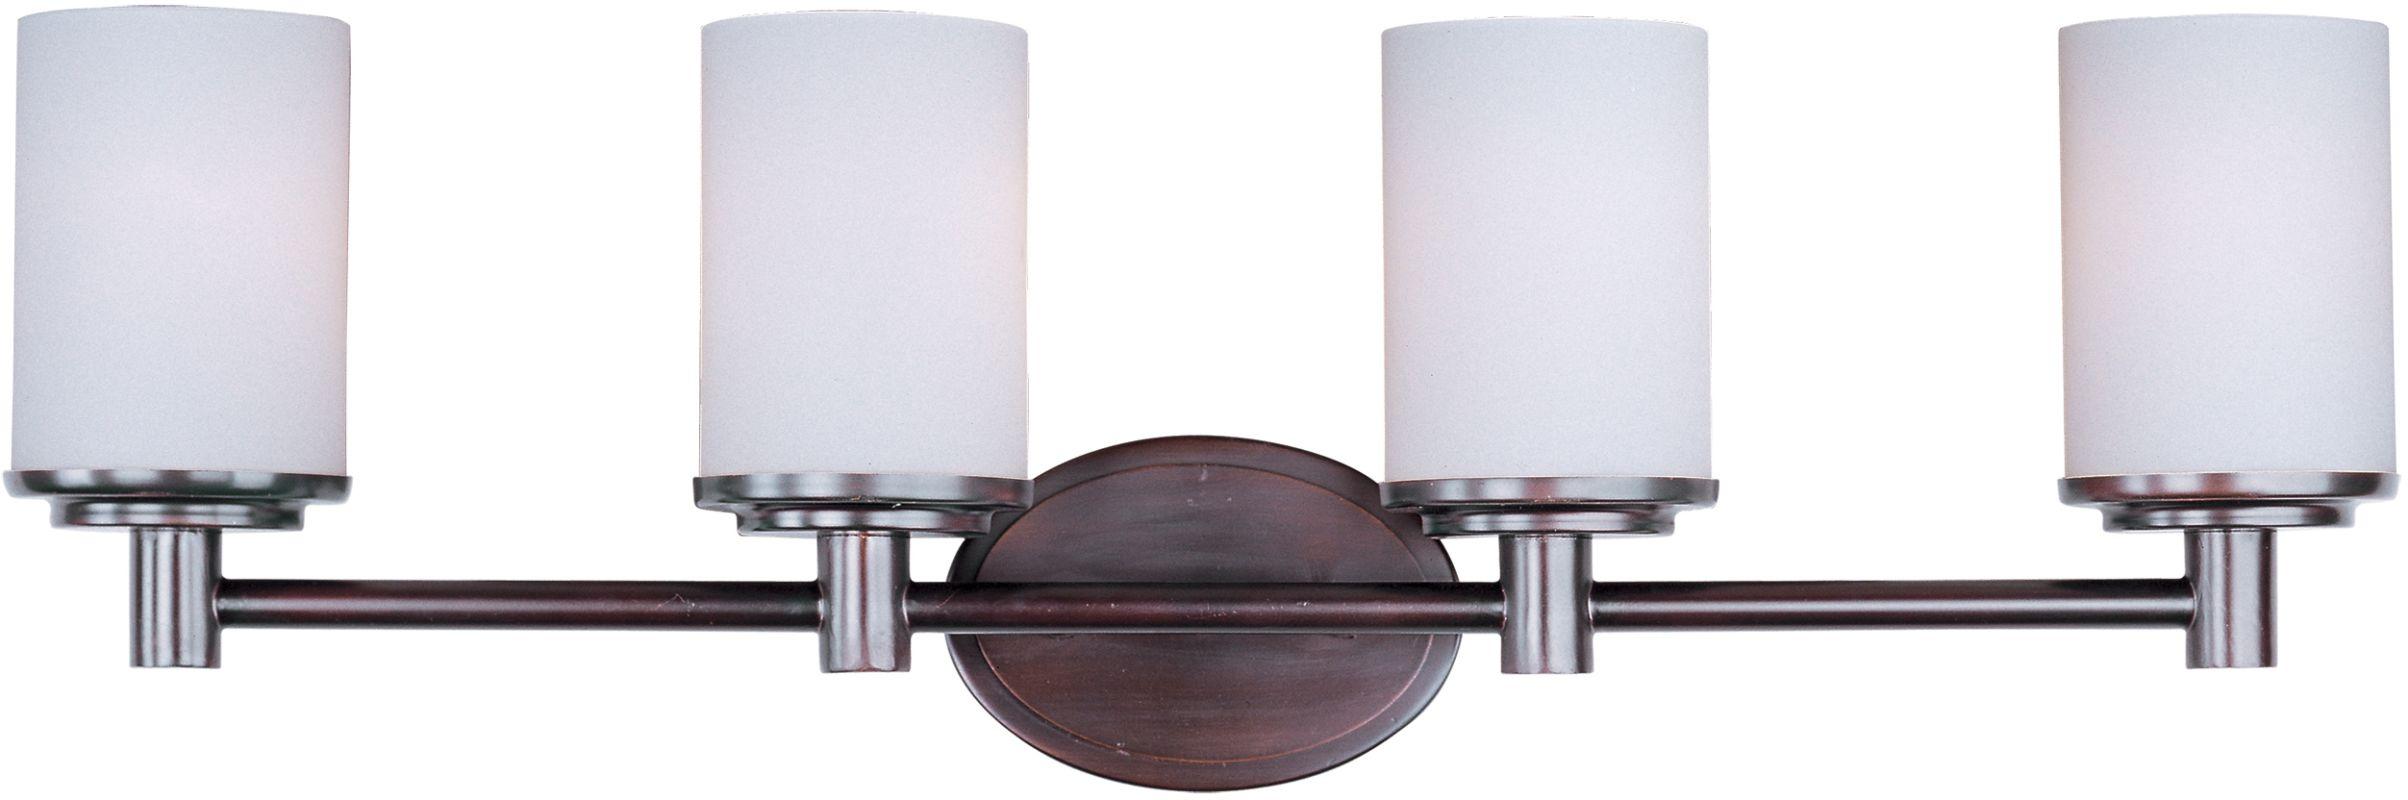 cylinder 29 wide 4 bulb bathroom light fixture